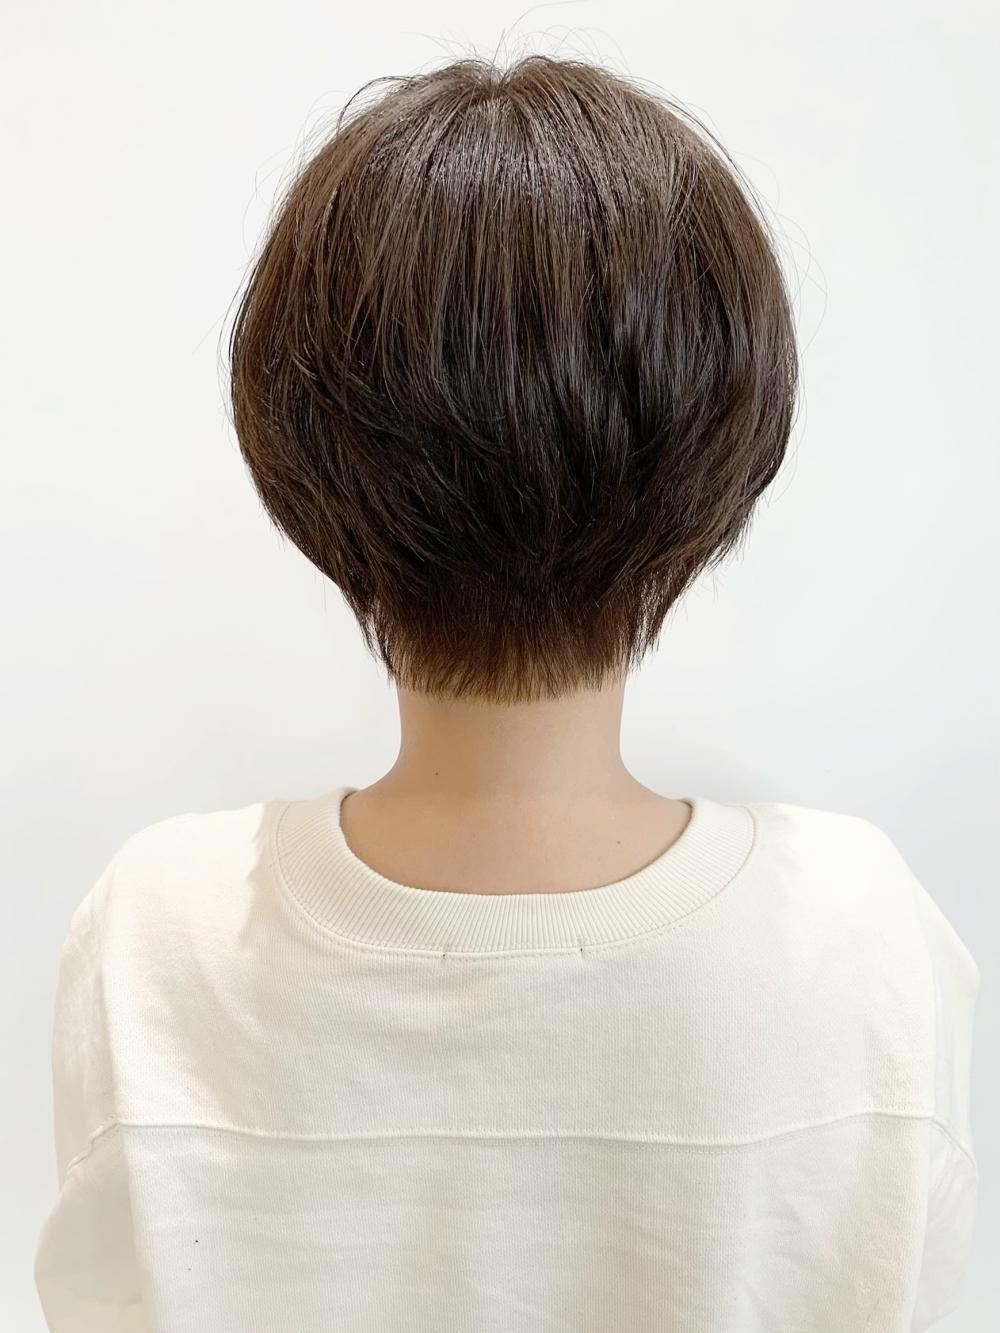 【feliceMICHI佐藤夏美】ハンサムショート